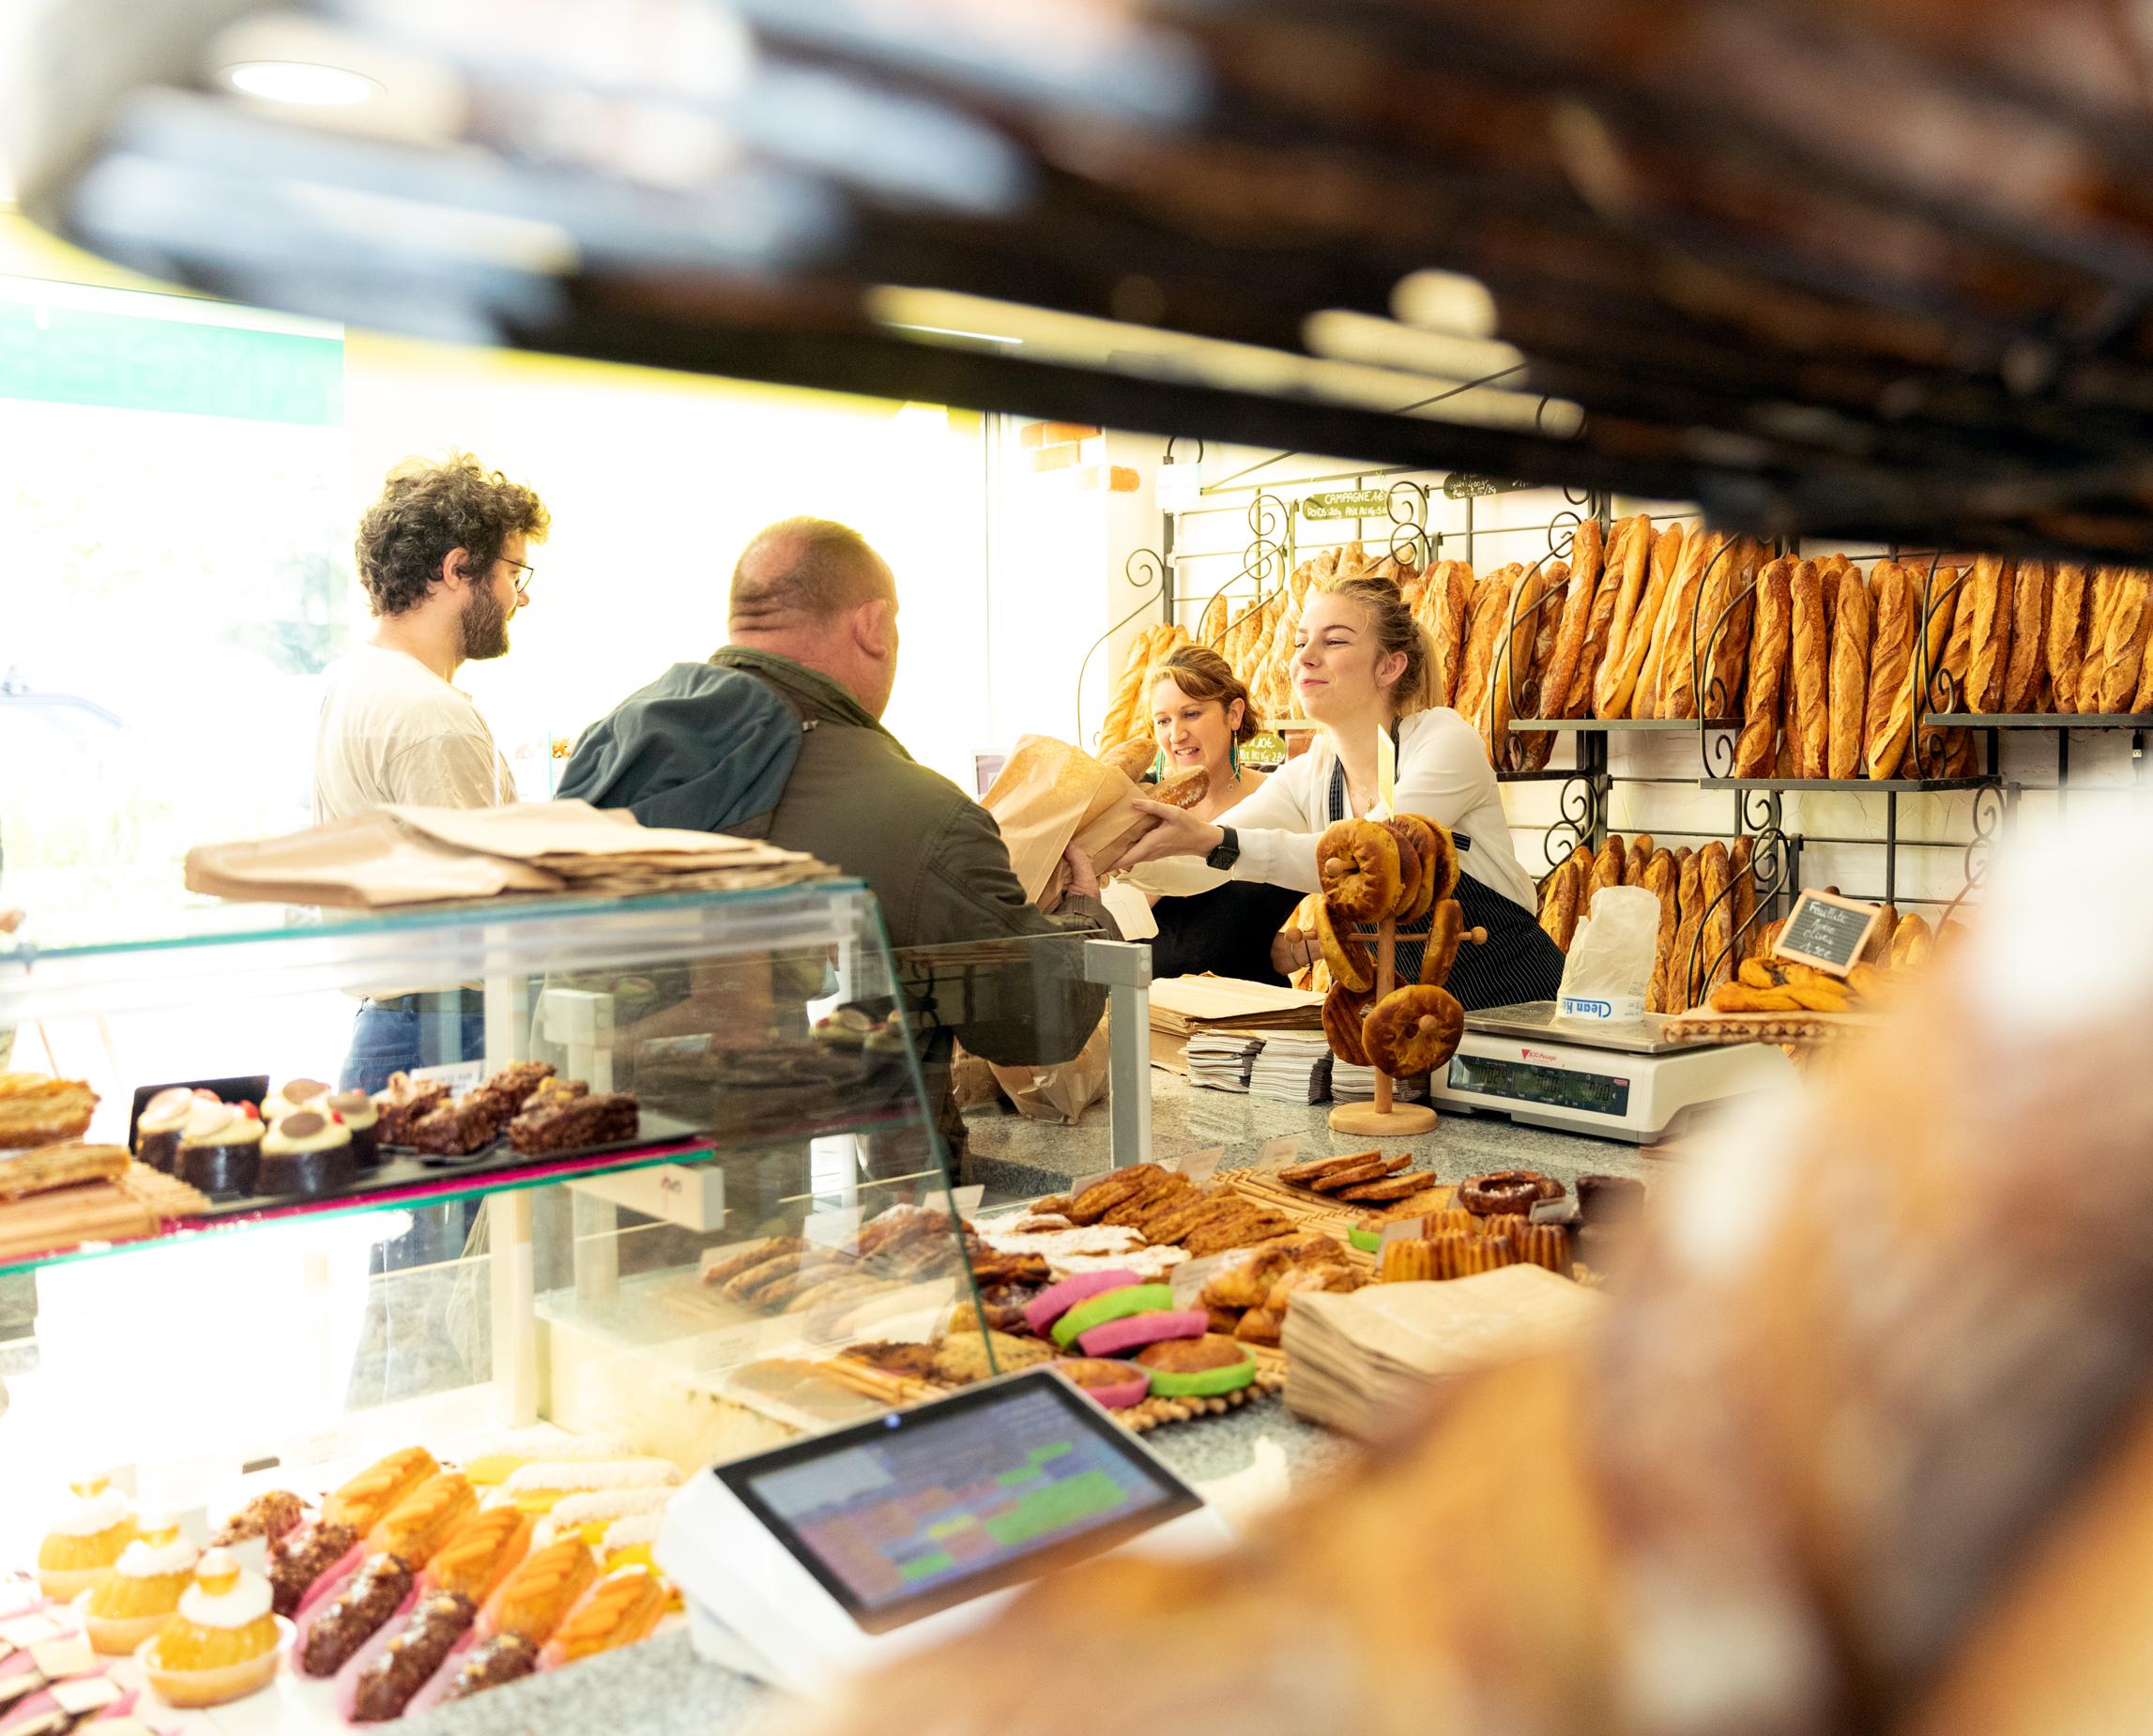 reportage-culinaire-©gaellebc-JPGhd-001